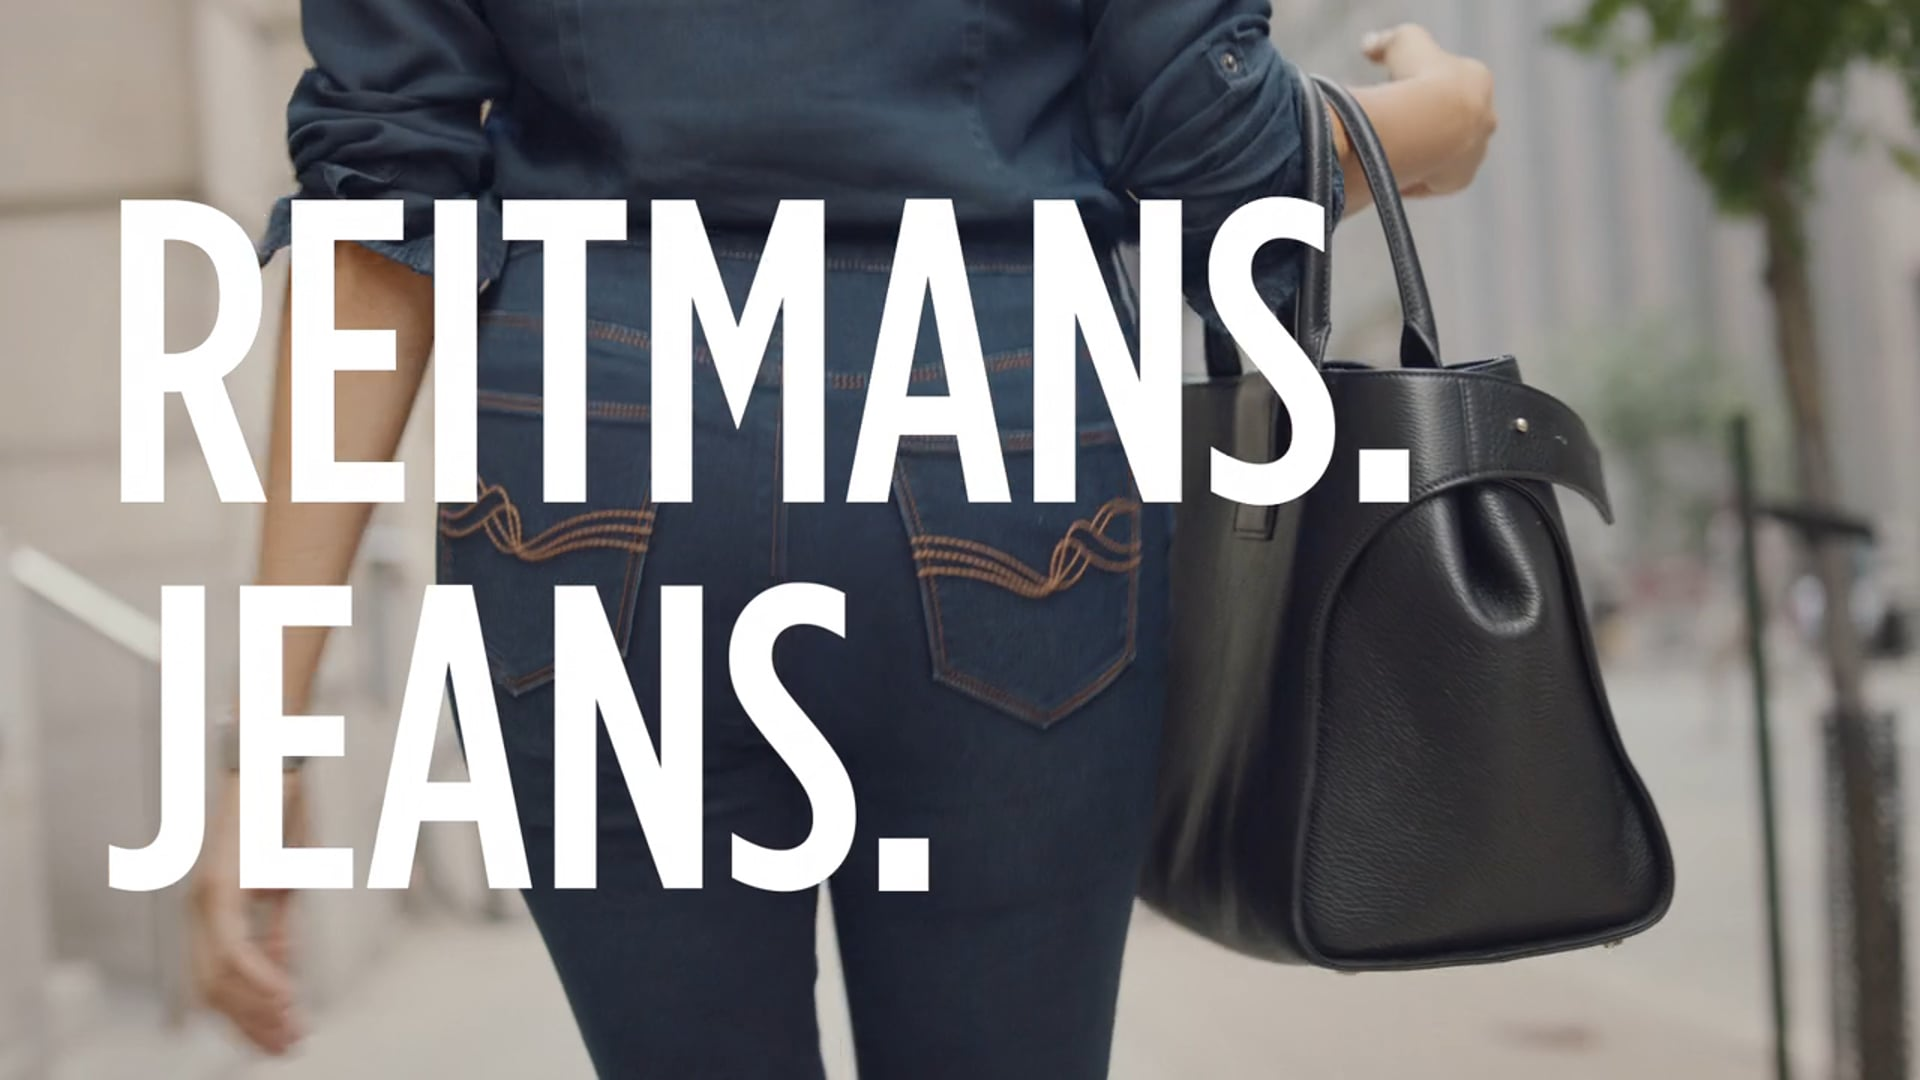 REITMANS // Meghan Markle